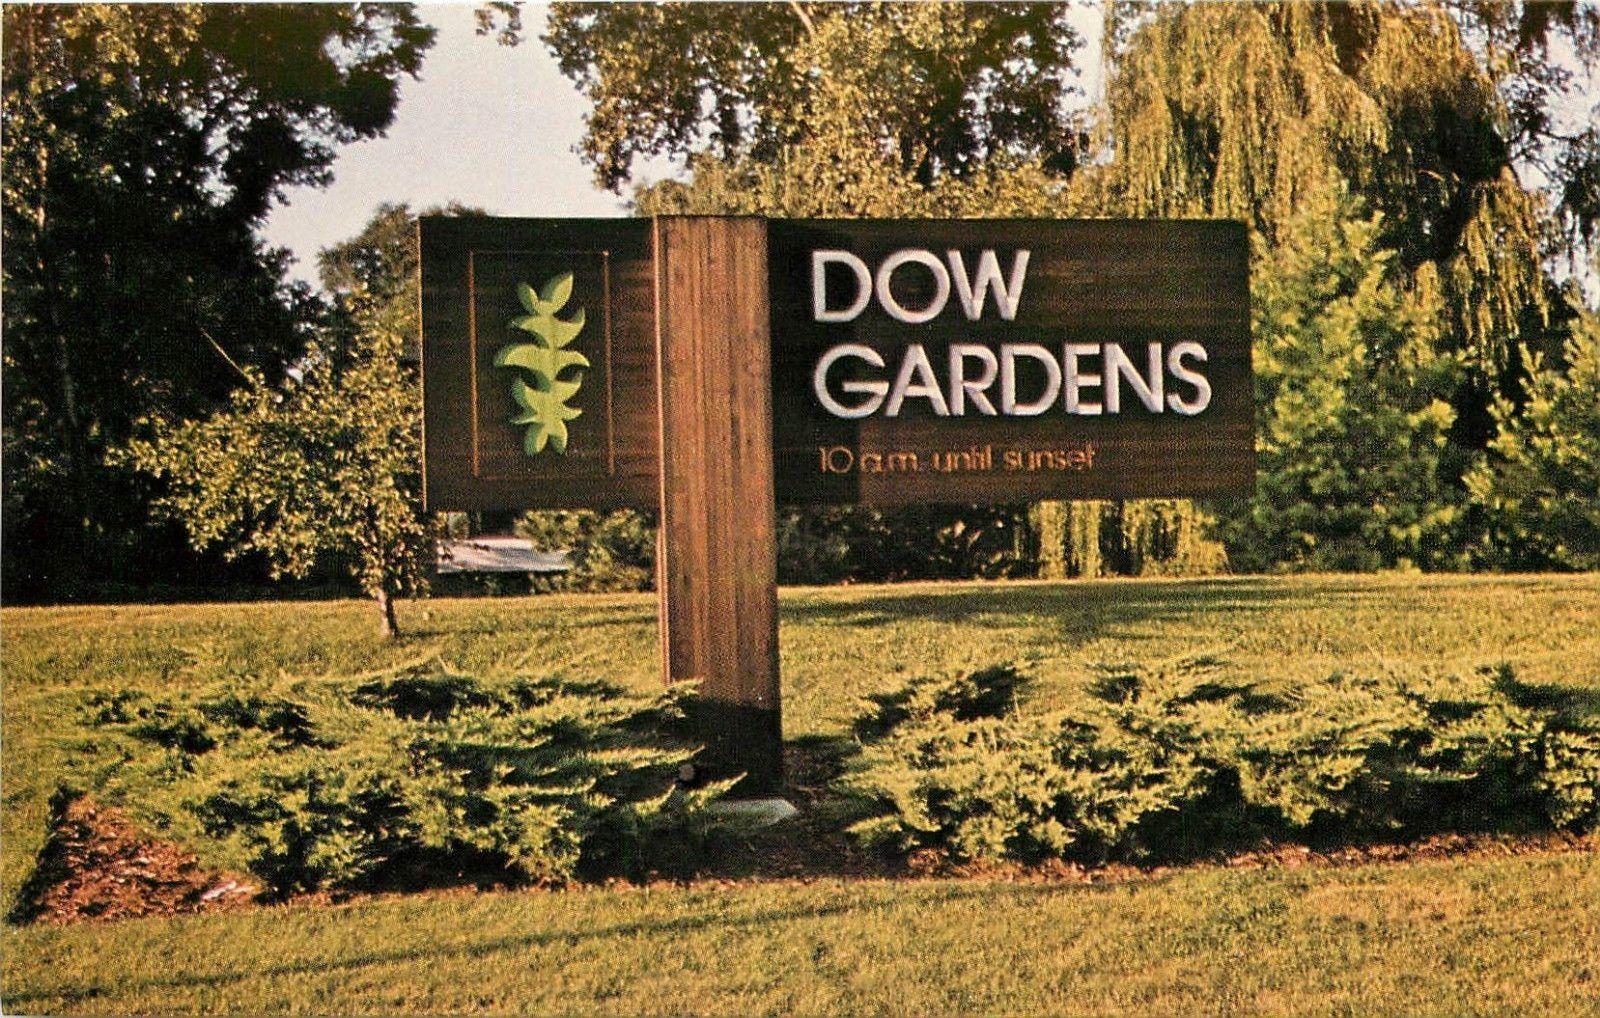 Dow Gardens Midland Michigan MI Postcard / HipPostcard